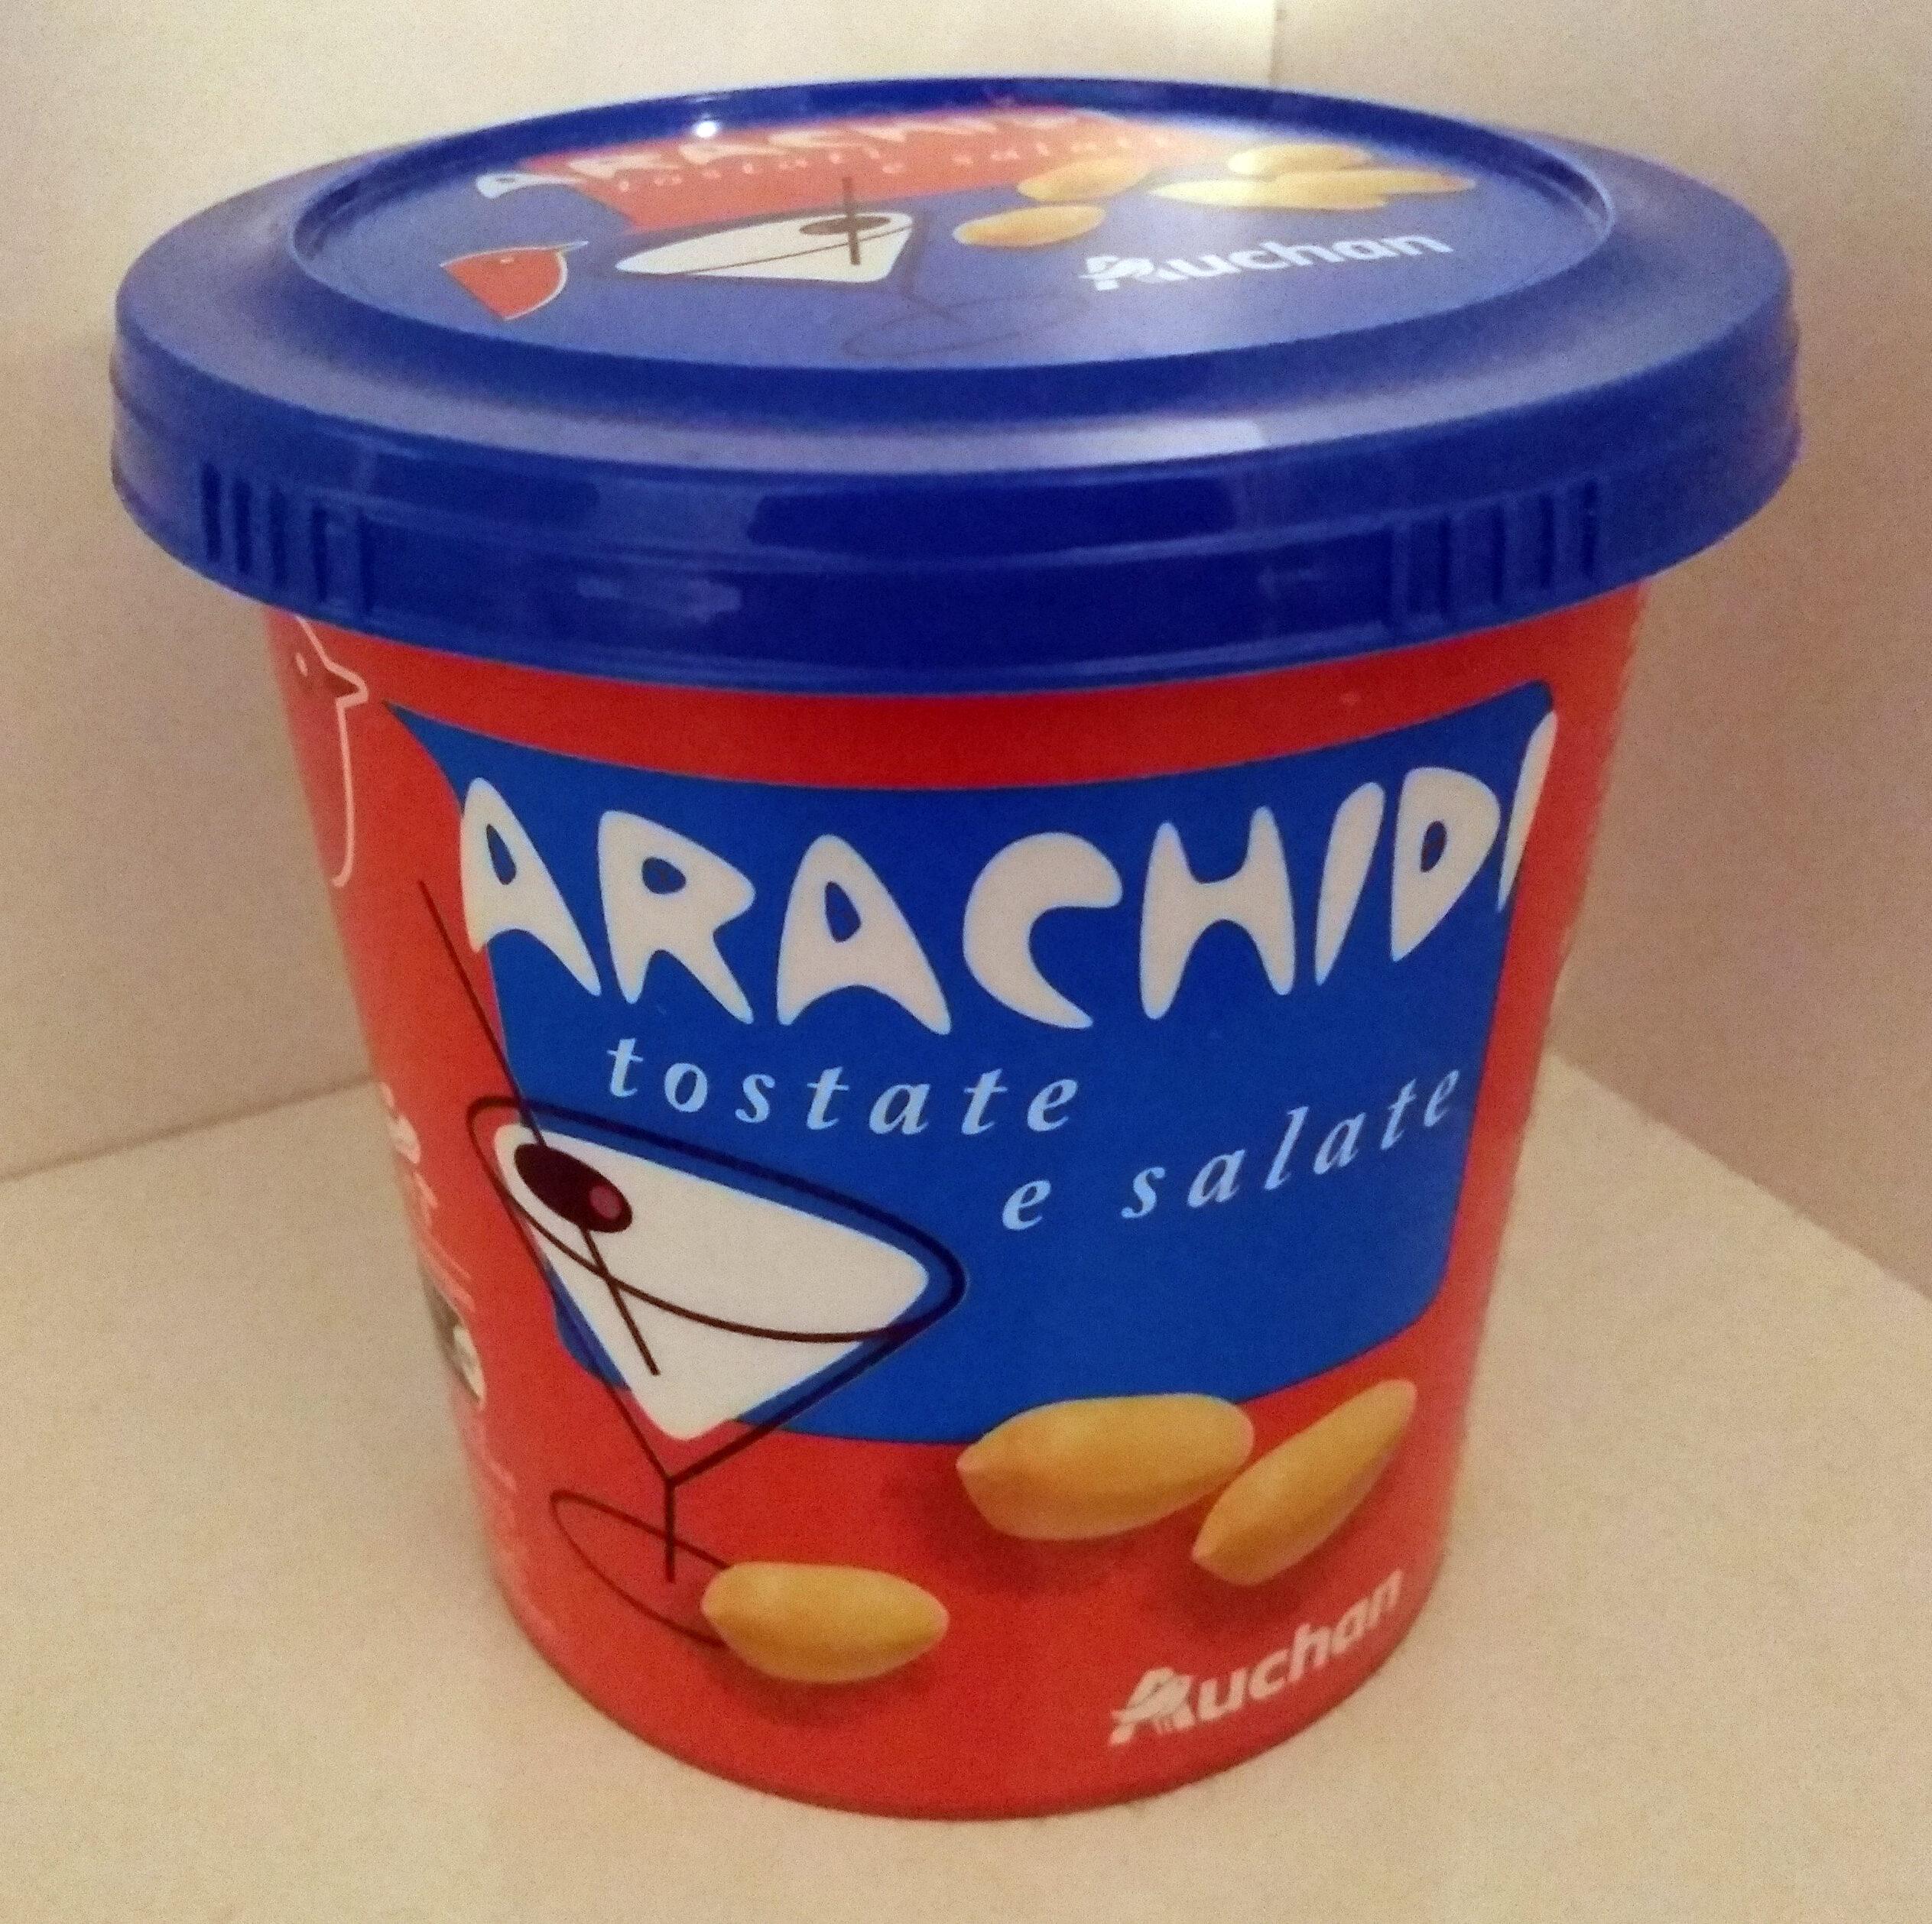 Arachidi tostati e salati - Product